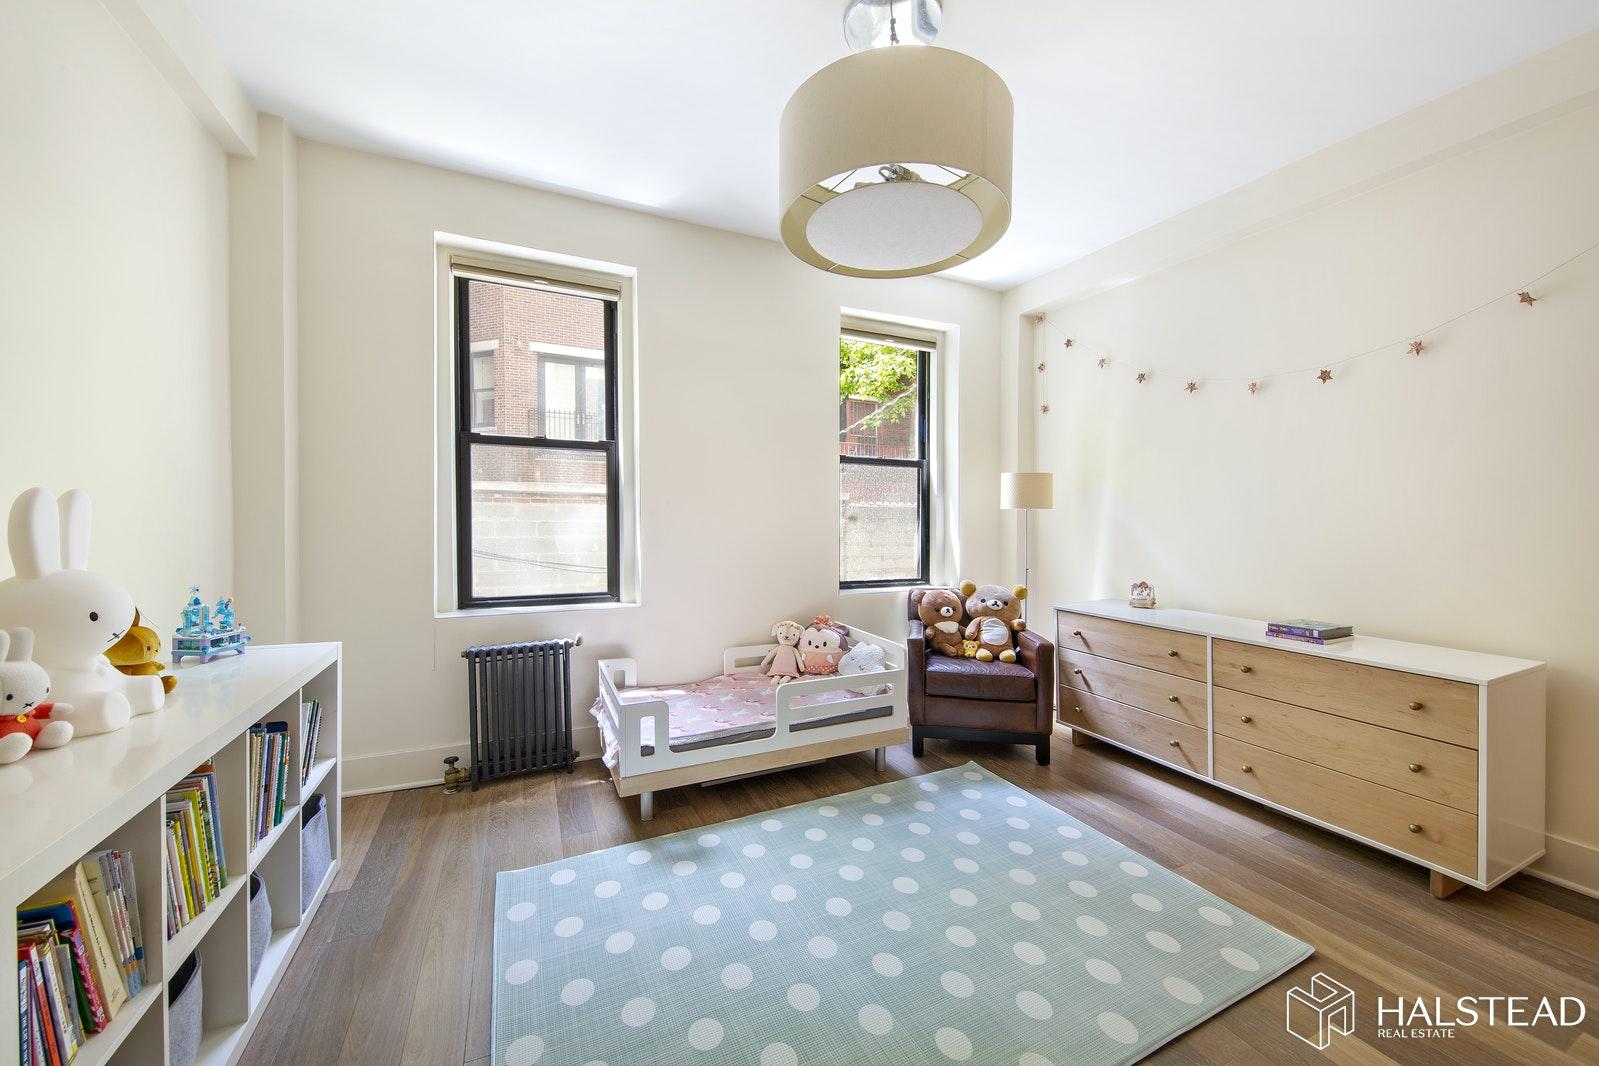 320 WEST 89TH STREET 1C, Upper West Side, $1,095,000, Web #: 20145702